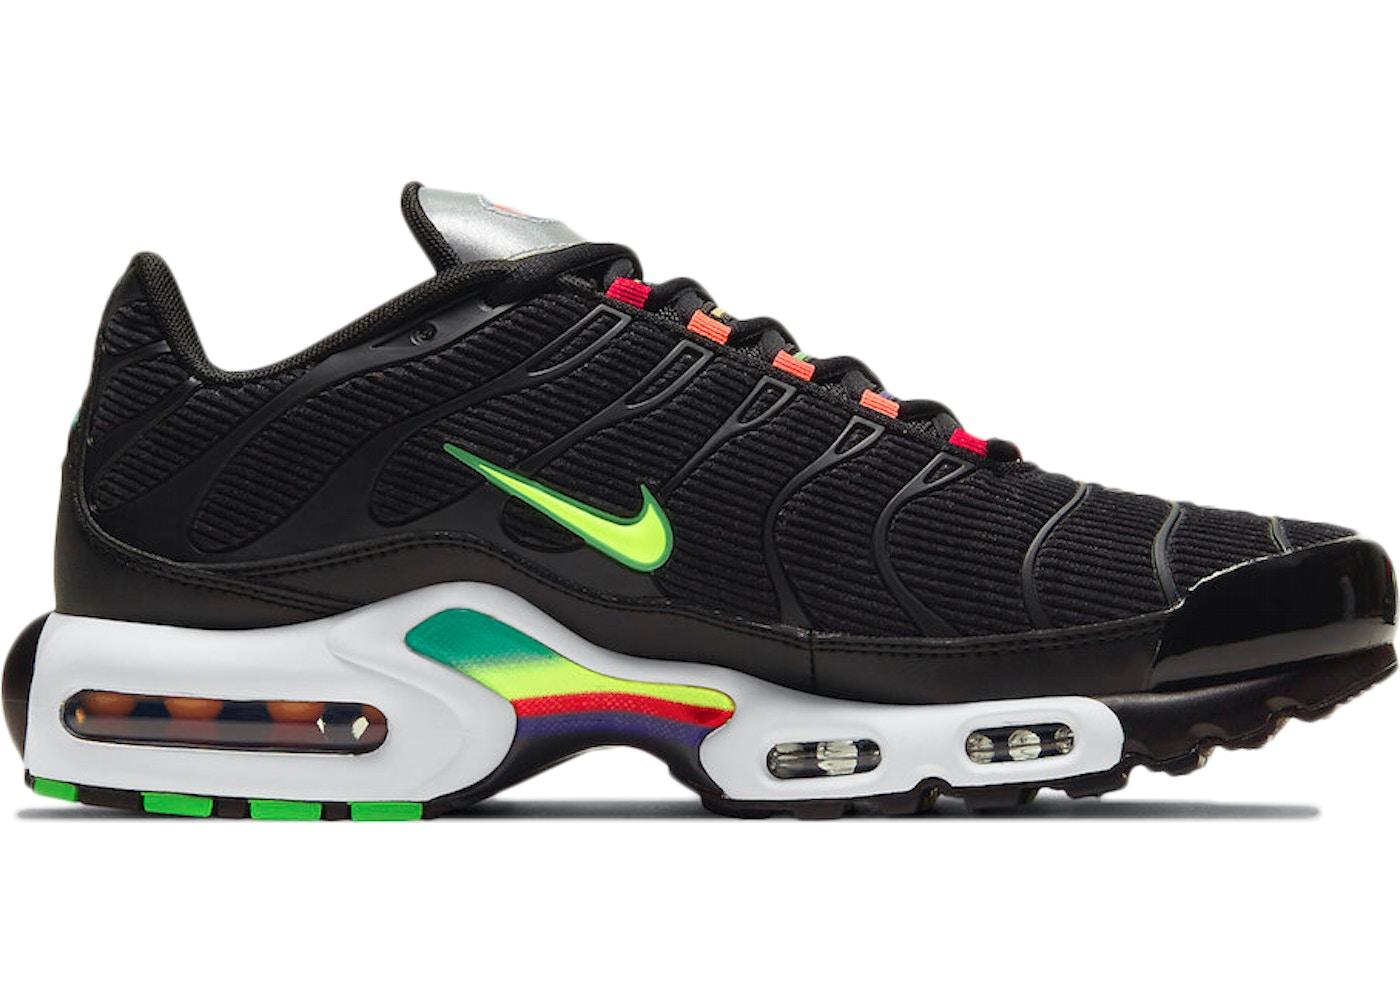 Acheter Nike Air Max Plus Chaussures et sneakers neuves